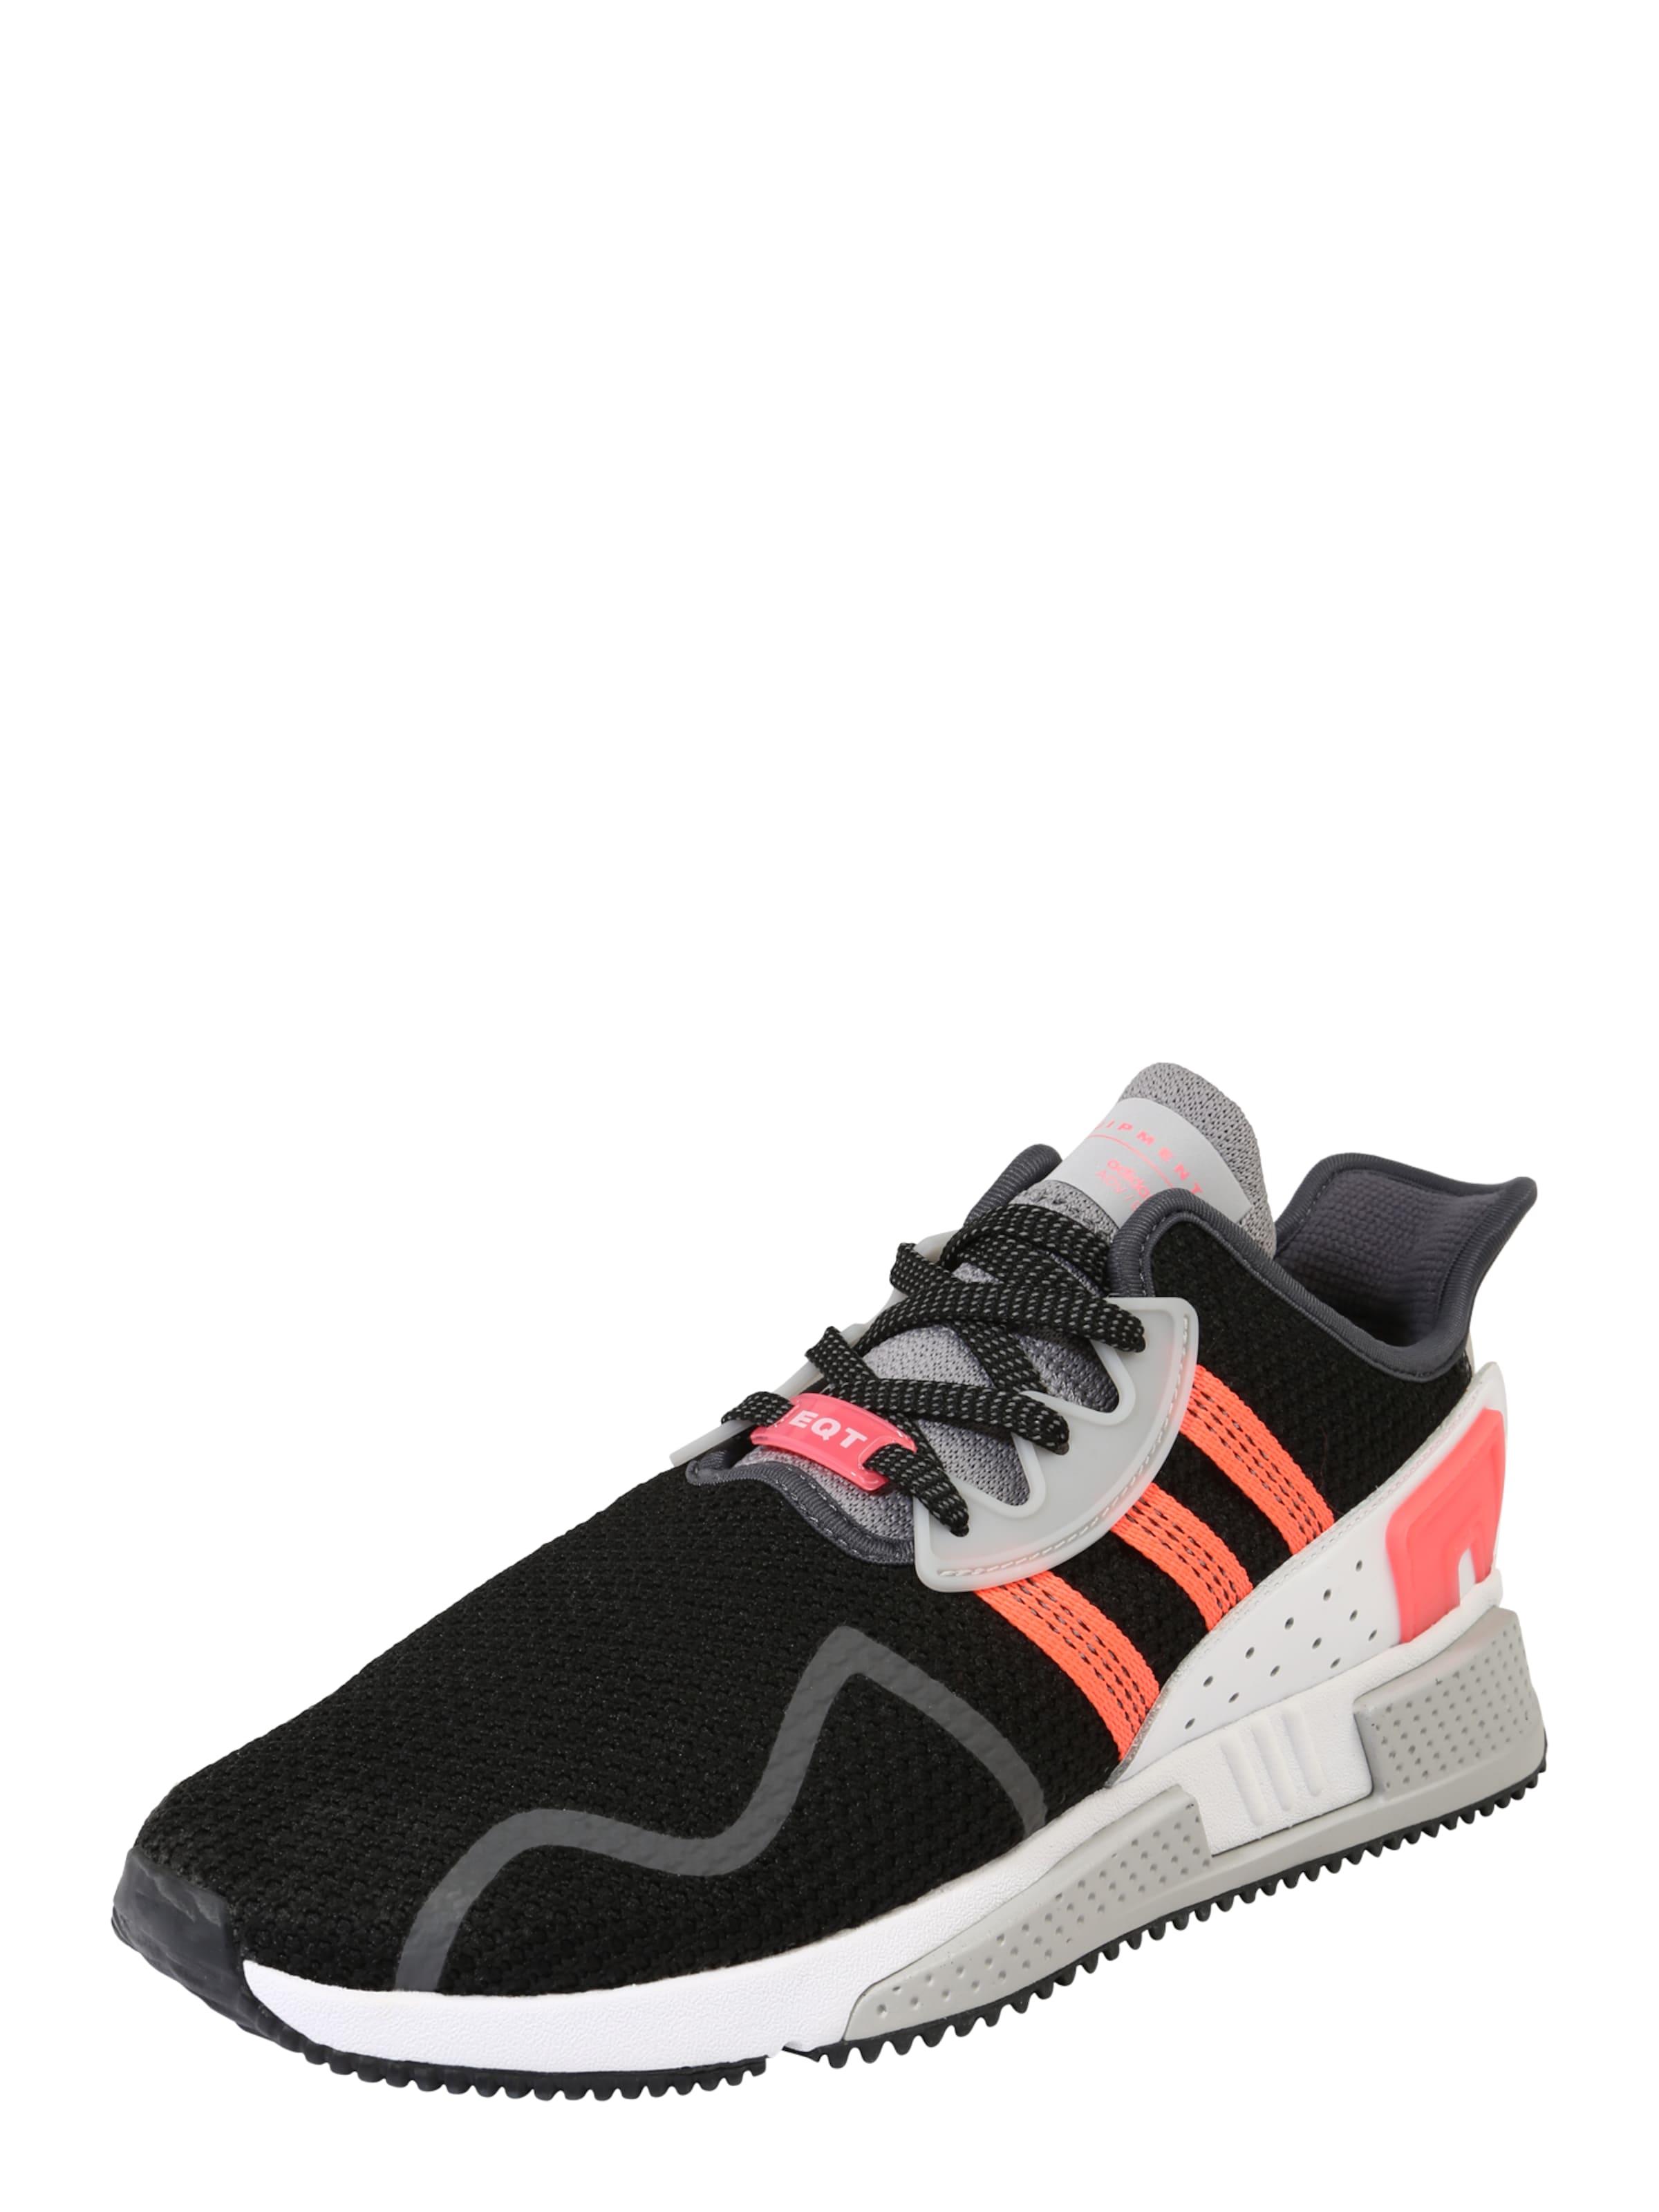 ADIDAS ORIGINALS Sneaker   Sneaker CUSHION ae6605